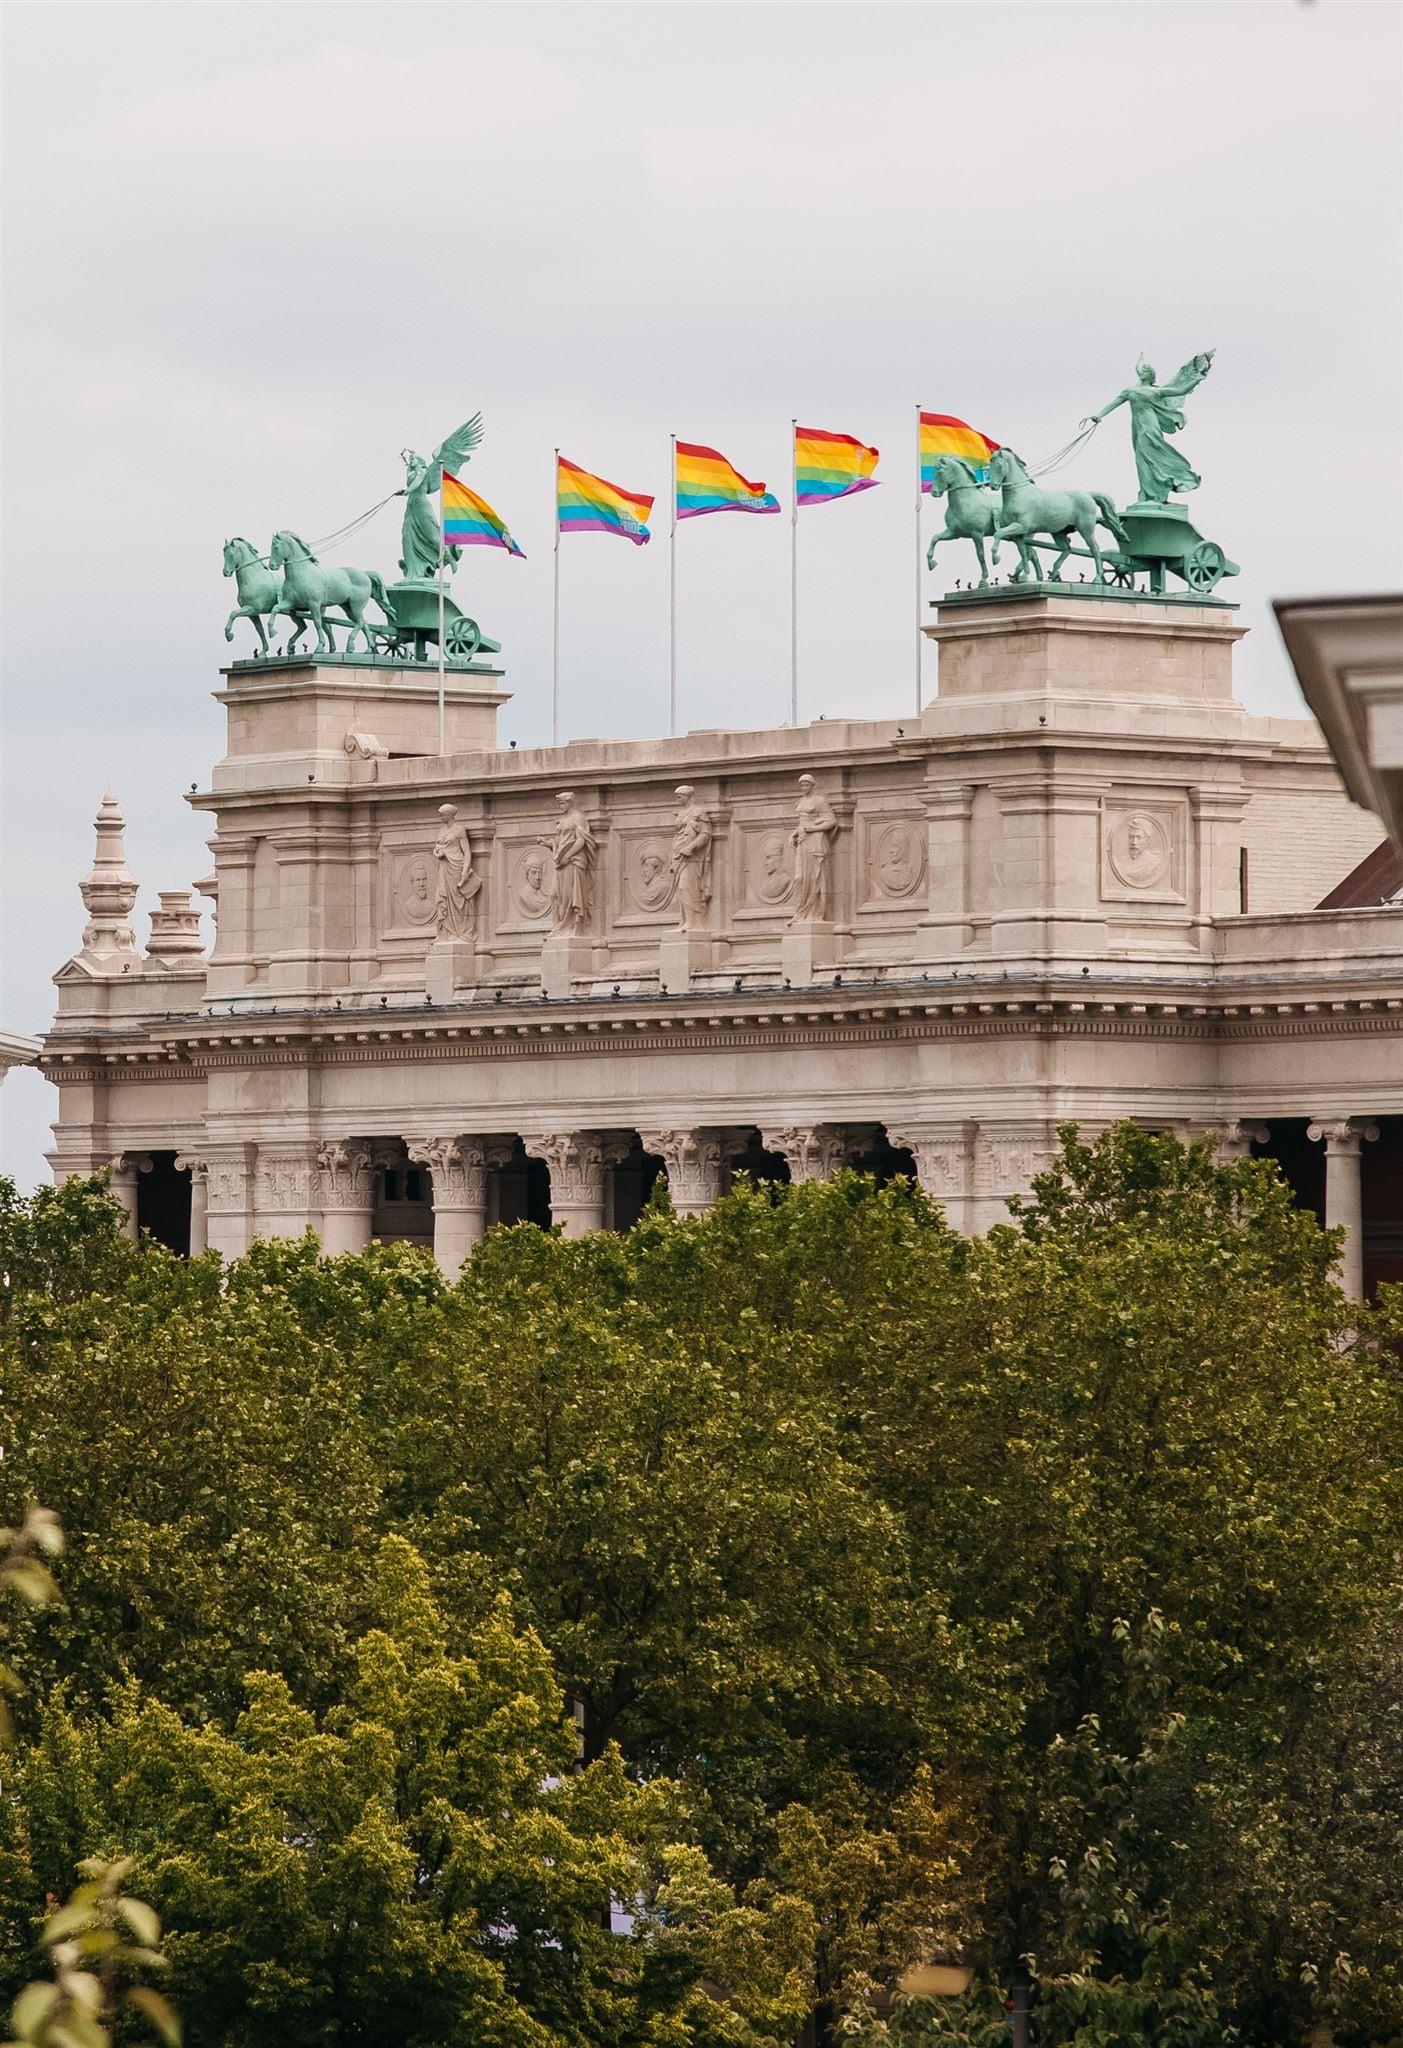 Museum In Antwerp Proudly Flies Rainbow Flags